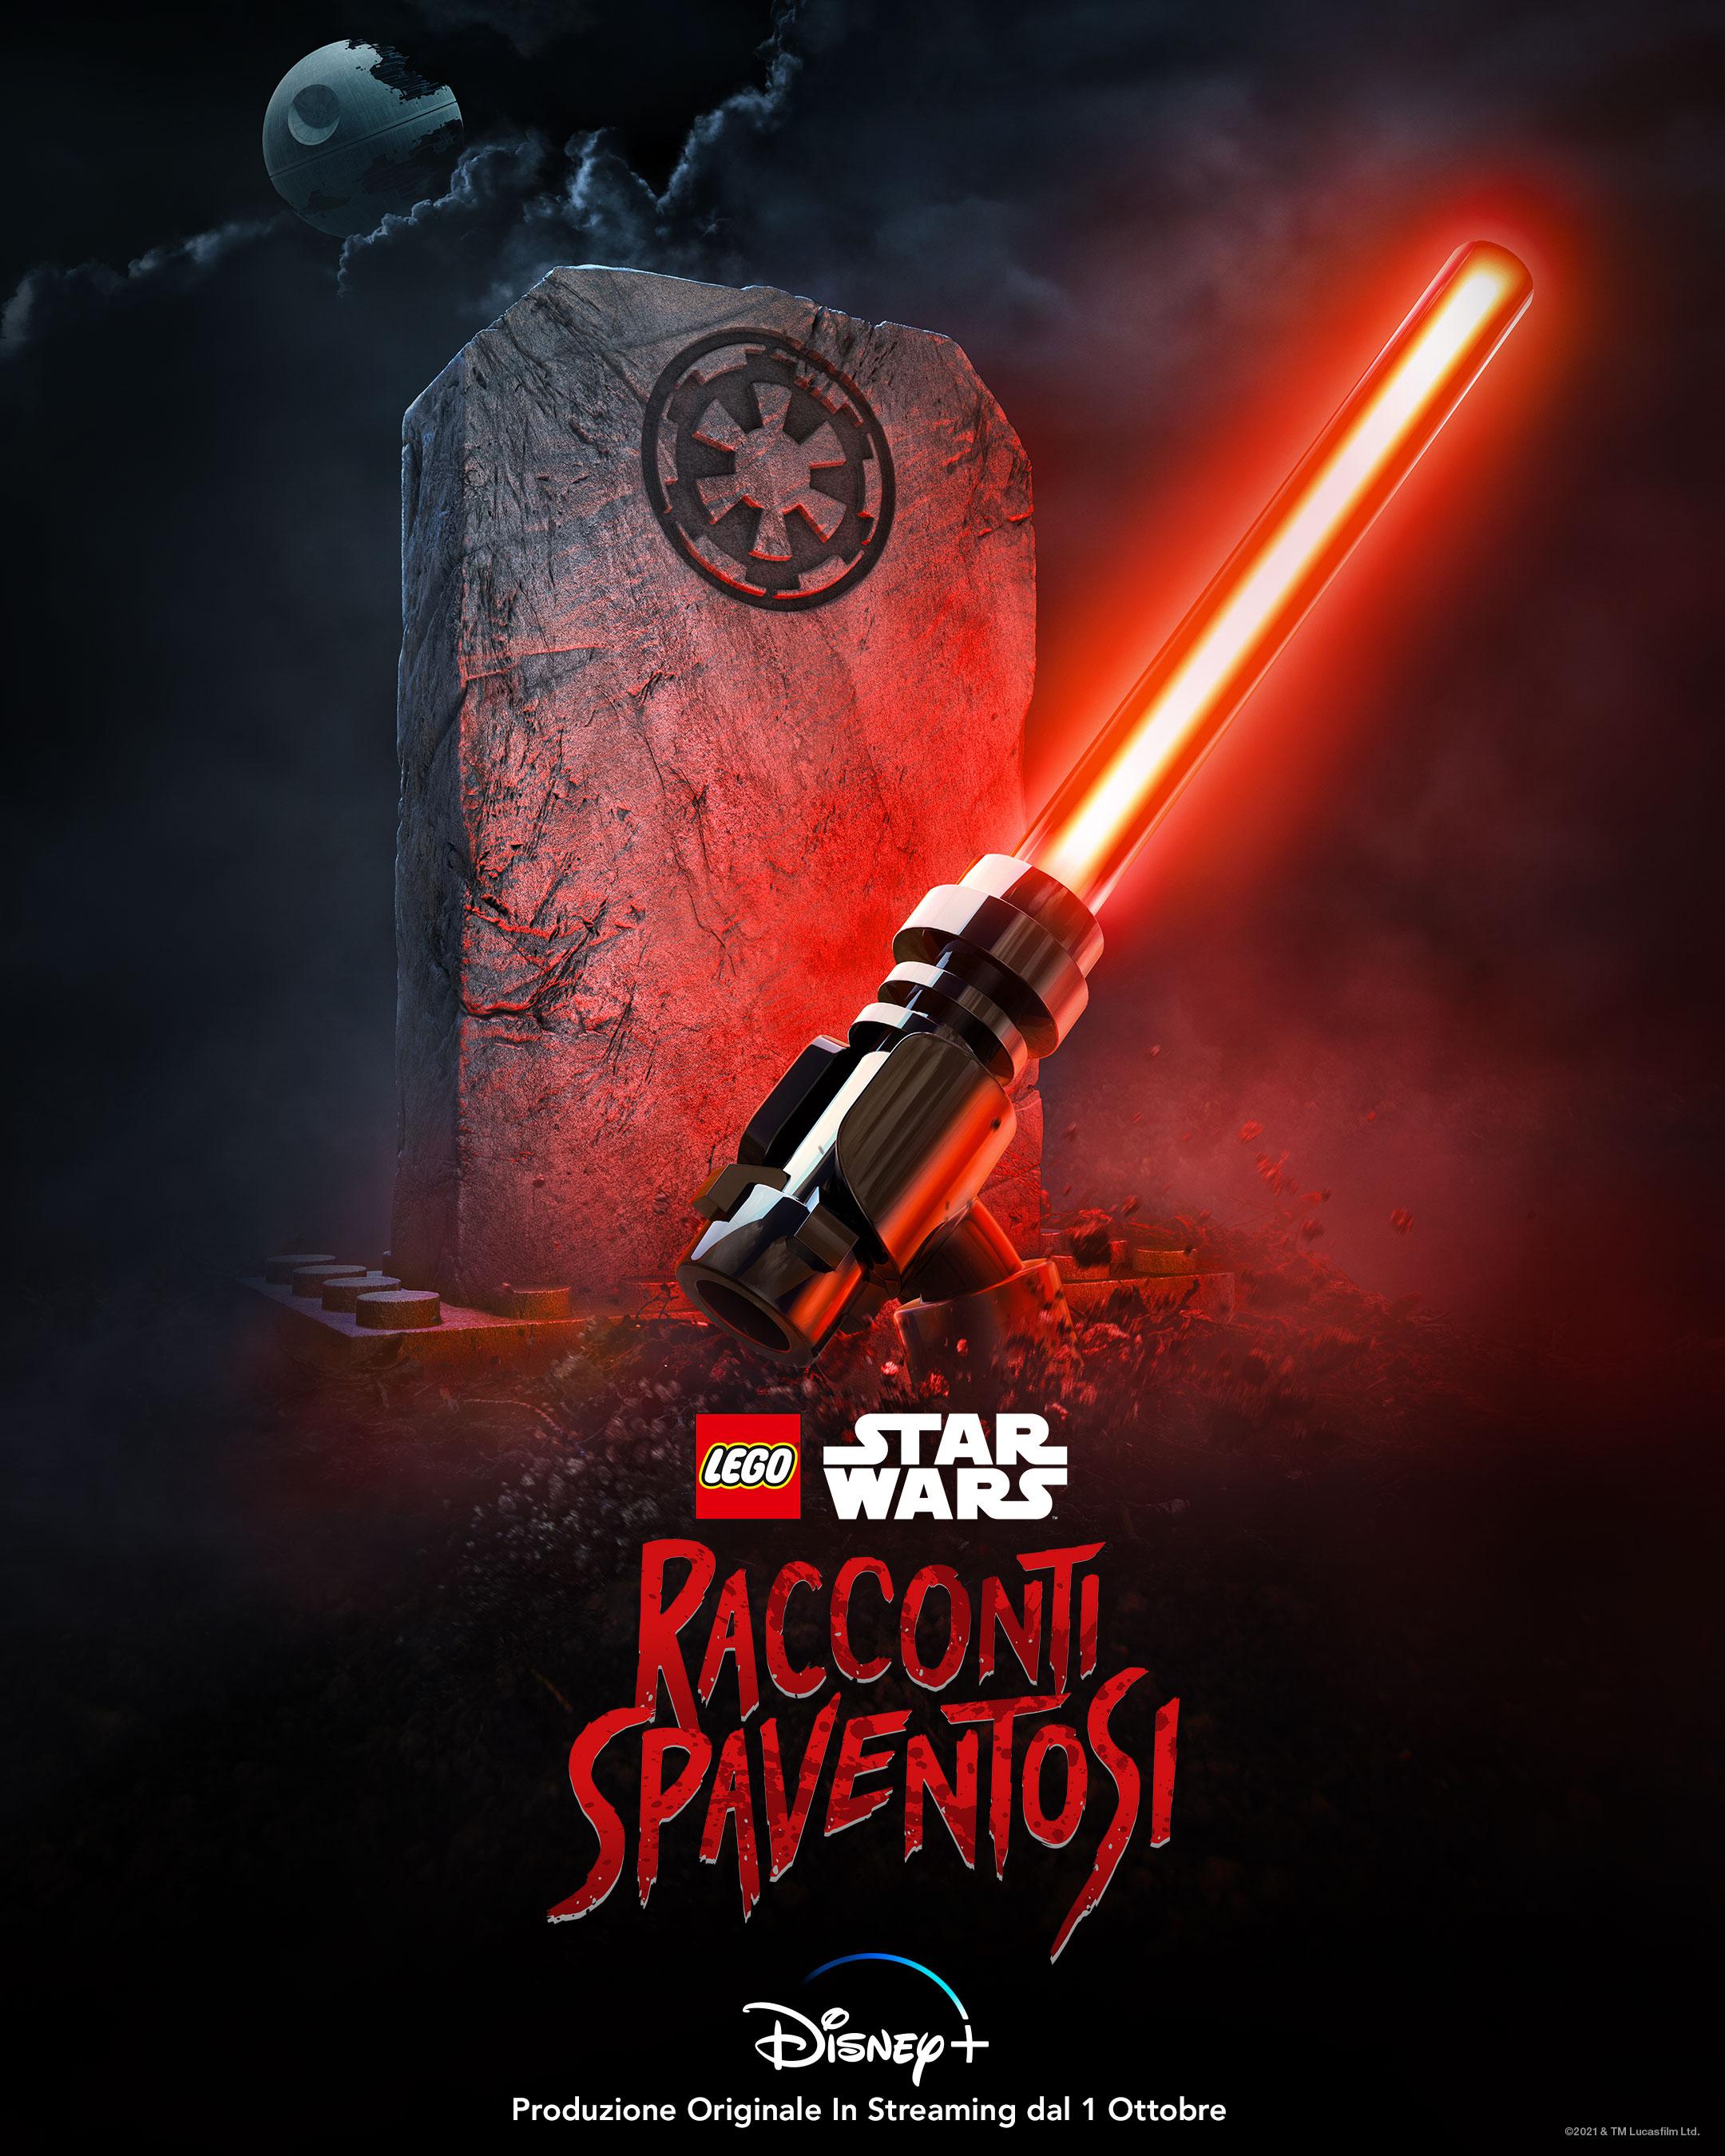 la key art ufficiale di lego star wars racconti spaventosi - nerdface